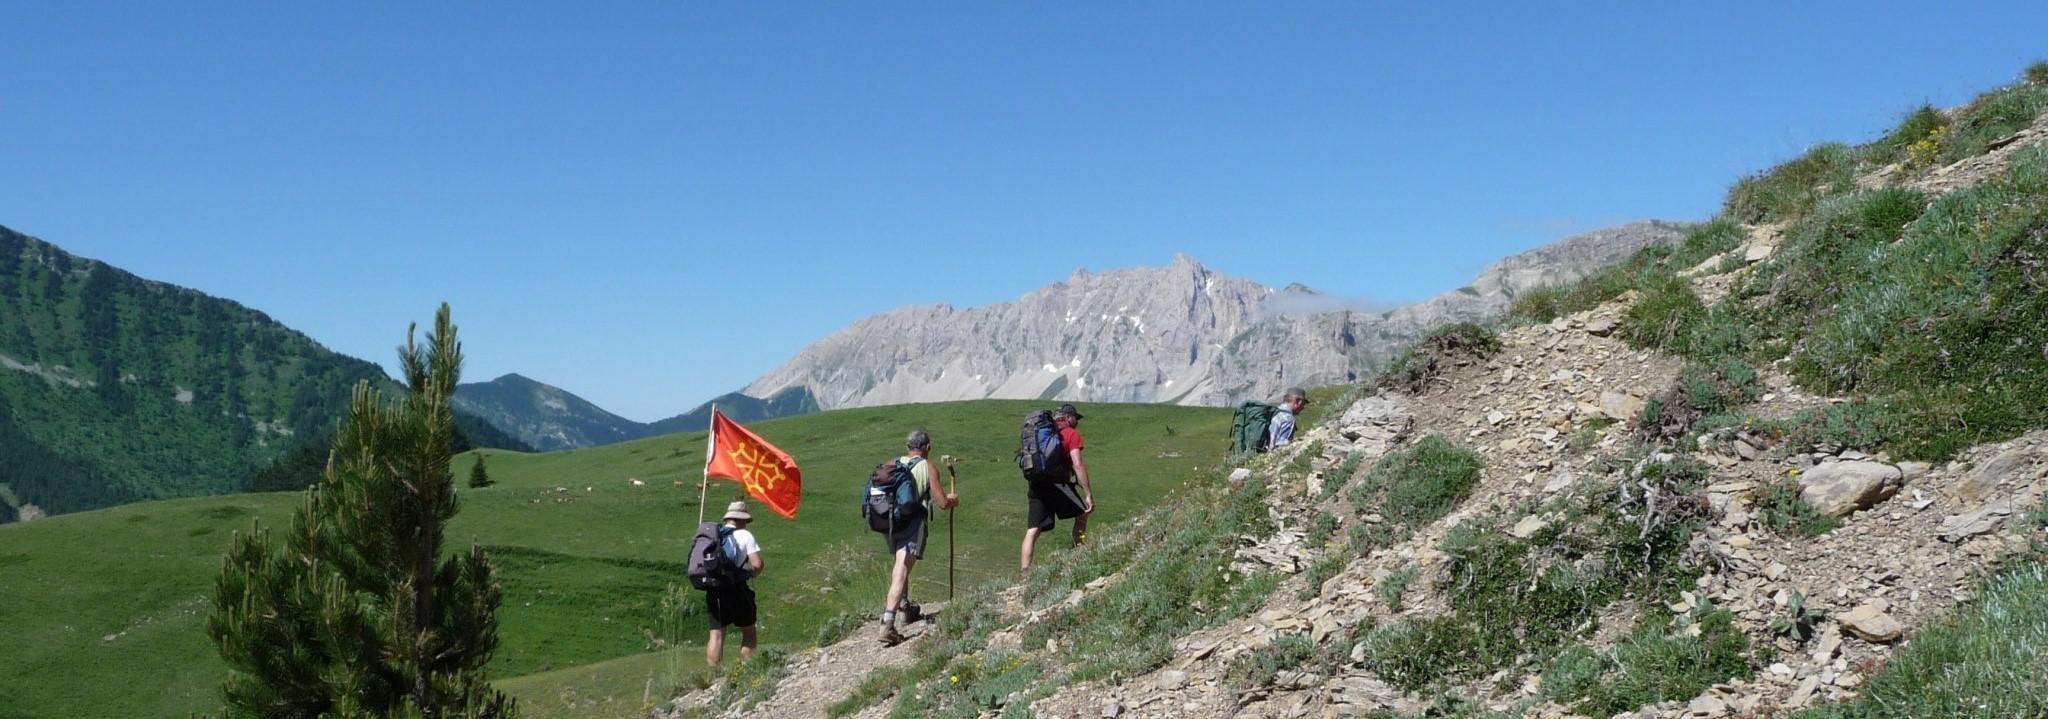 Balade occitane Hautes-Alpes